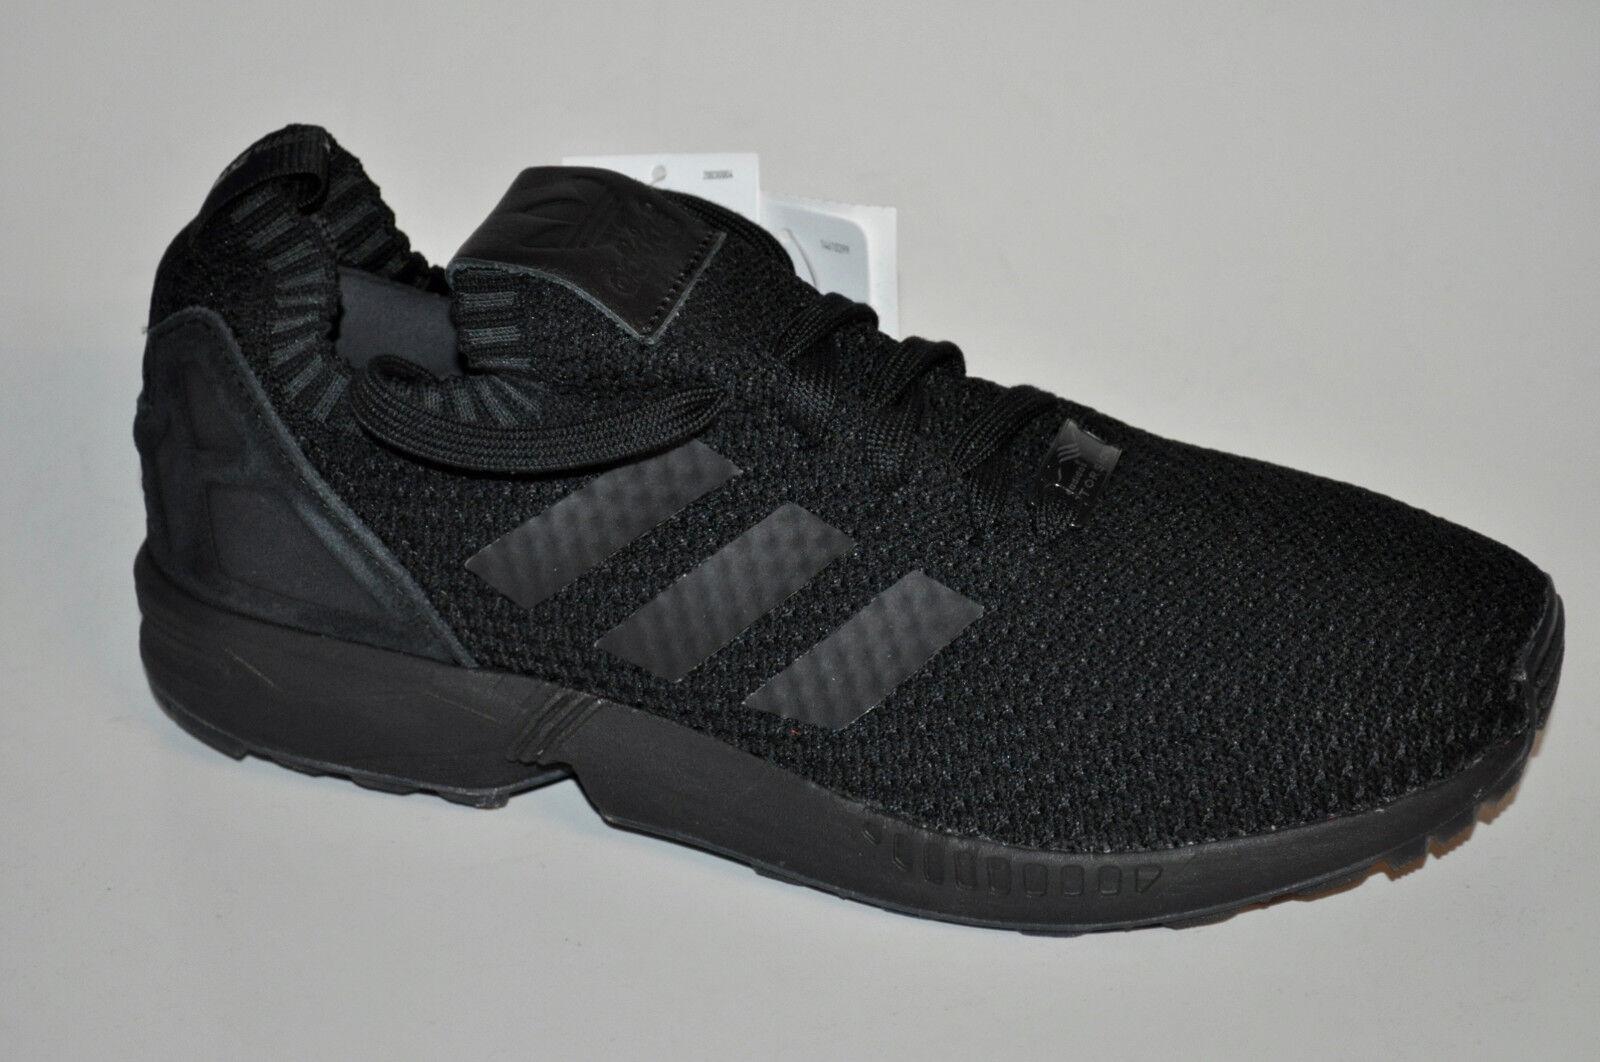 Adidas ZX Negro Flux PK s75976 cNegro Negro ZX negro 5d862f